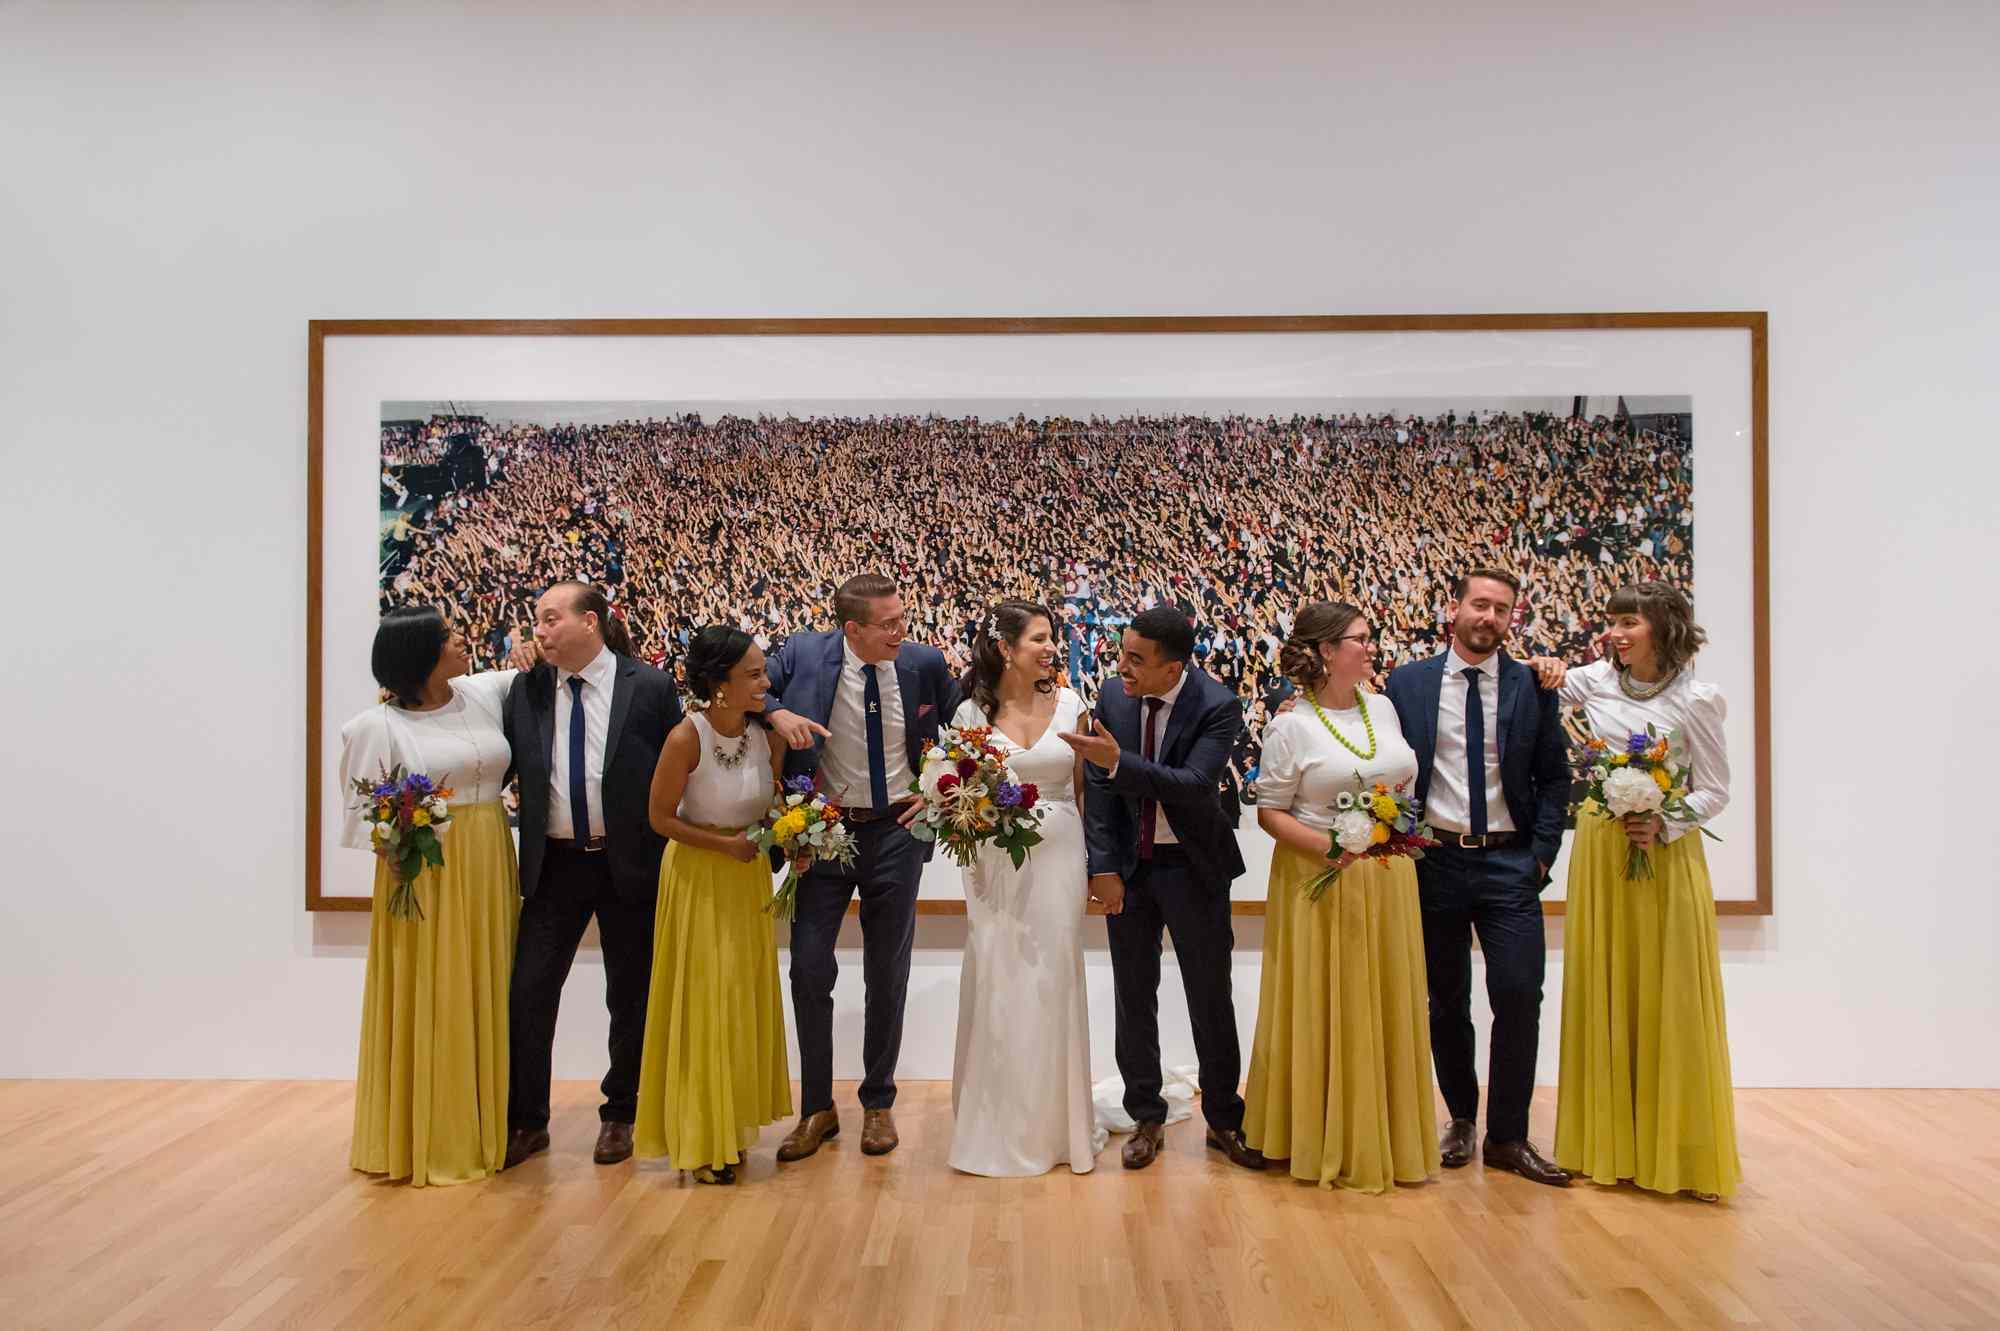 10 Tips For Capturing Stunning Indoor Wedding Photos